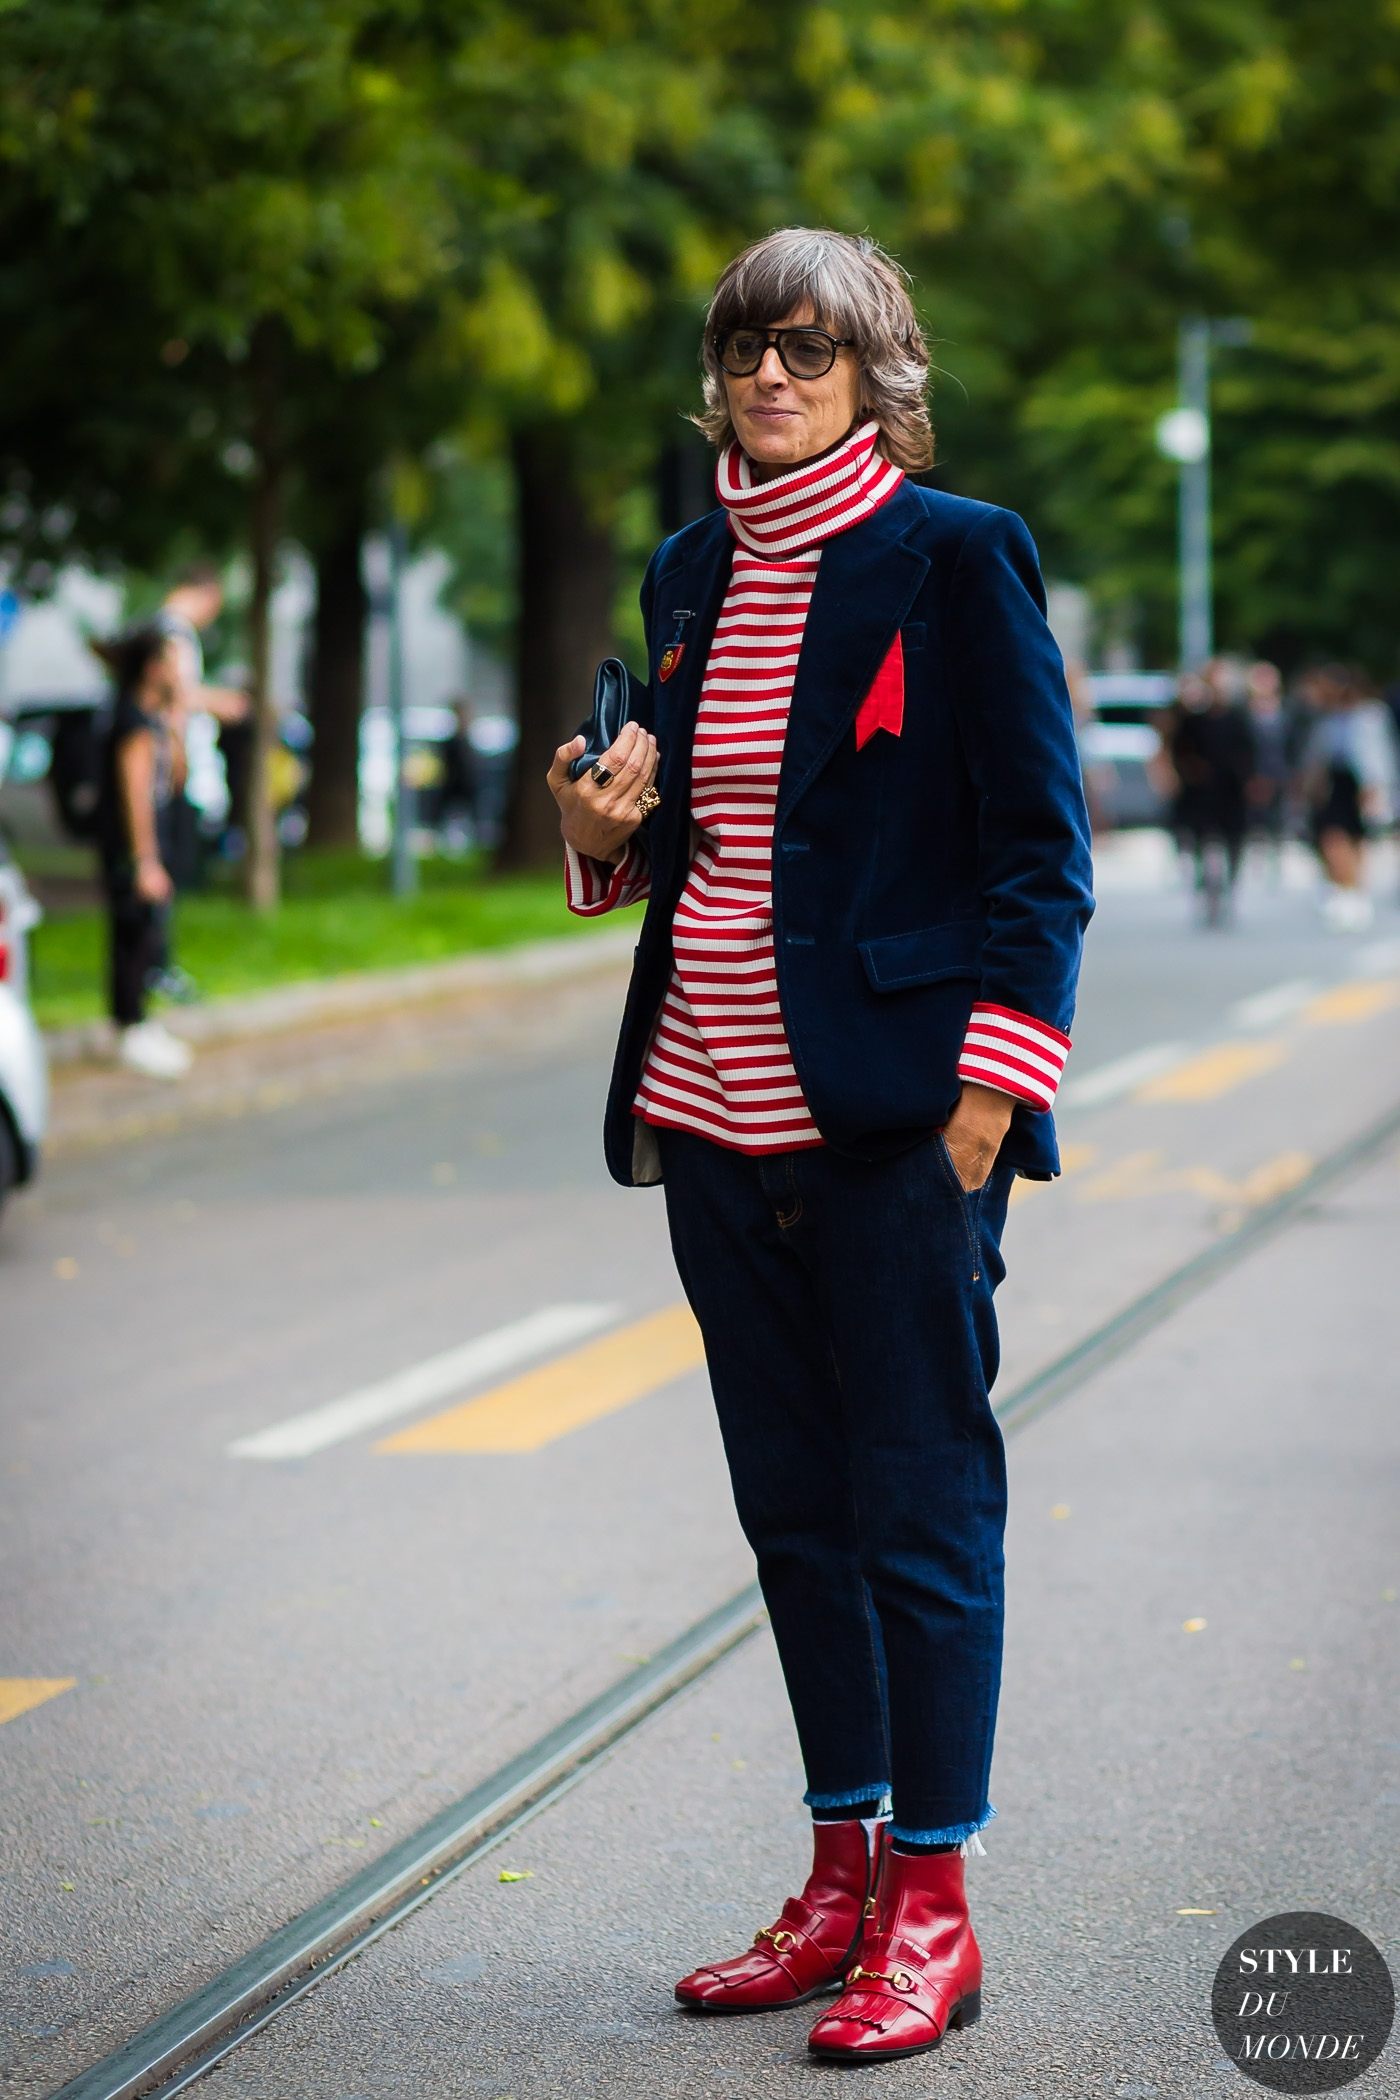 Ana-Gimeno-Brugada-Milan-SS17-by-STYLEDUMONDE-Street-Style-Fashion-Photography0E2A4249-700x1050@2x